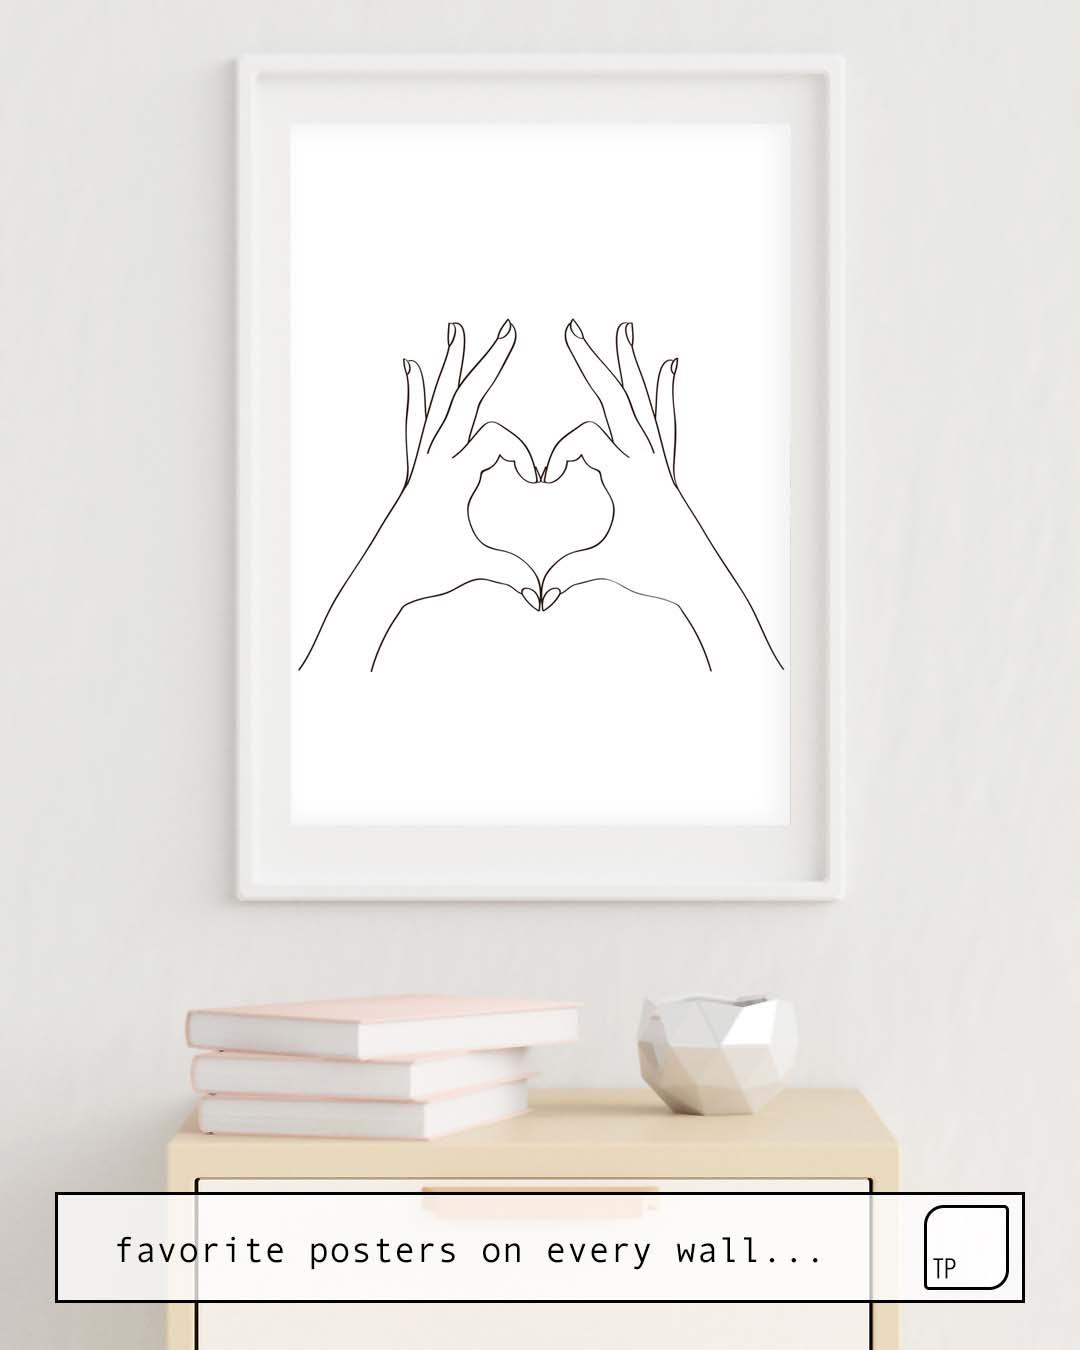 Poster | LOVE HEART von Andreas12